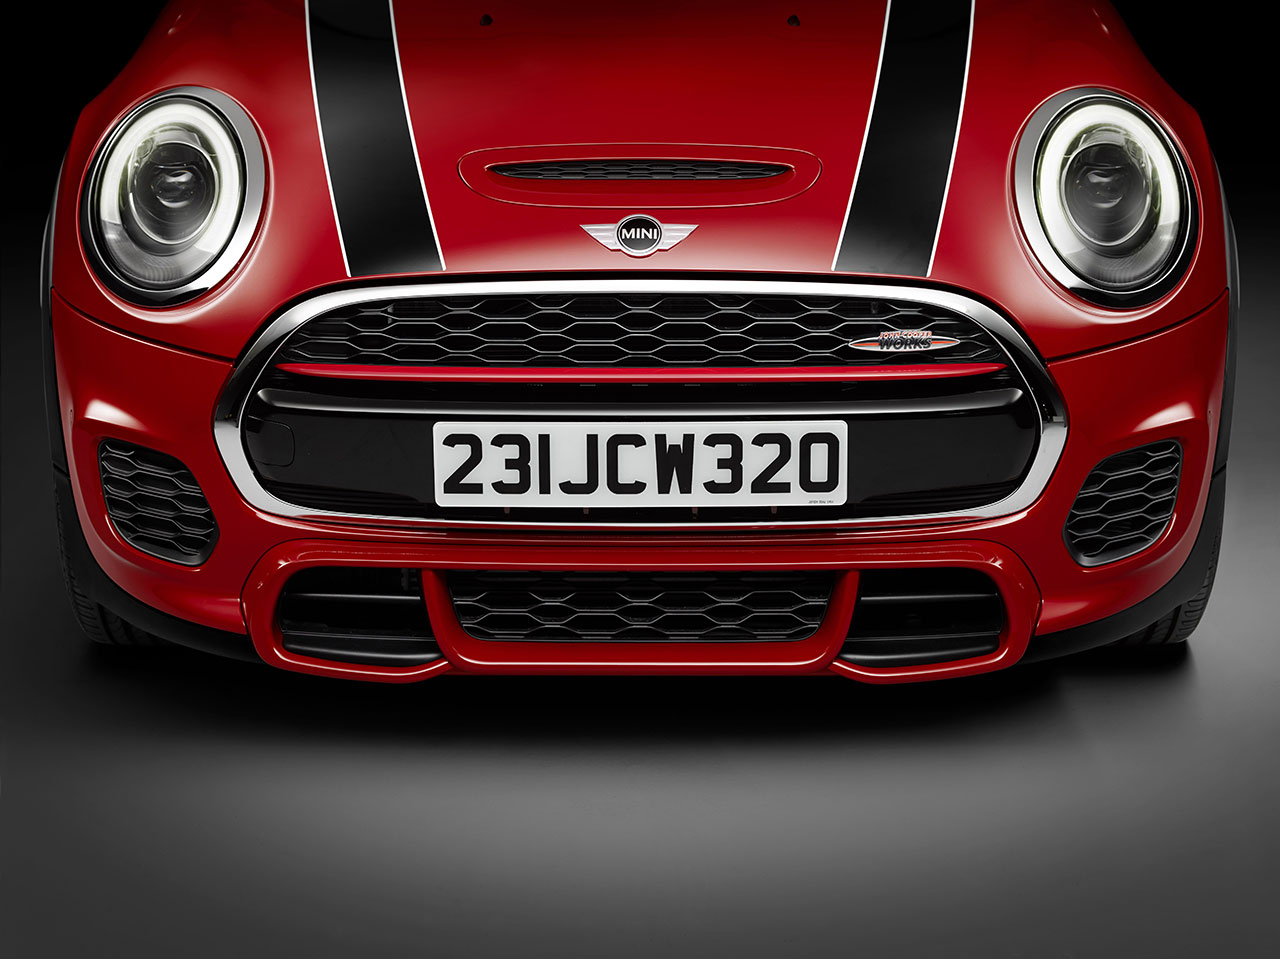 Mini John Cooper Works Hatch front